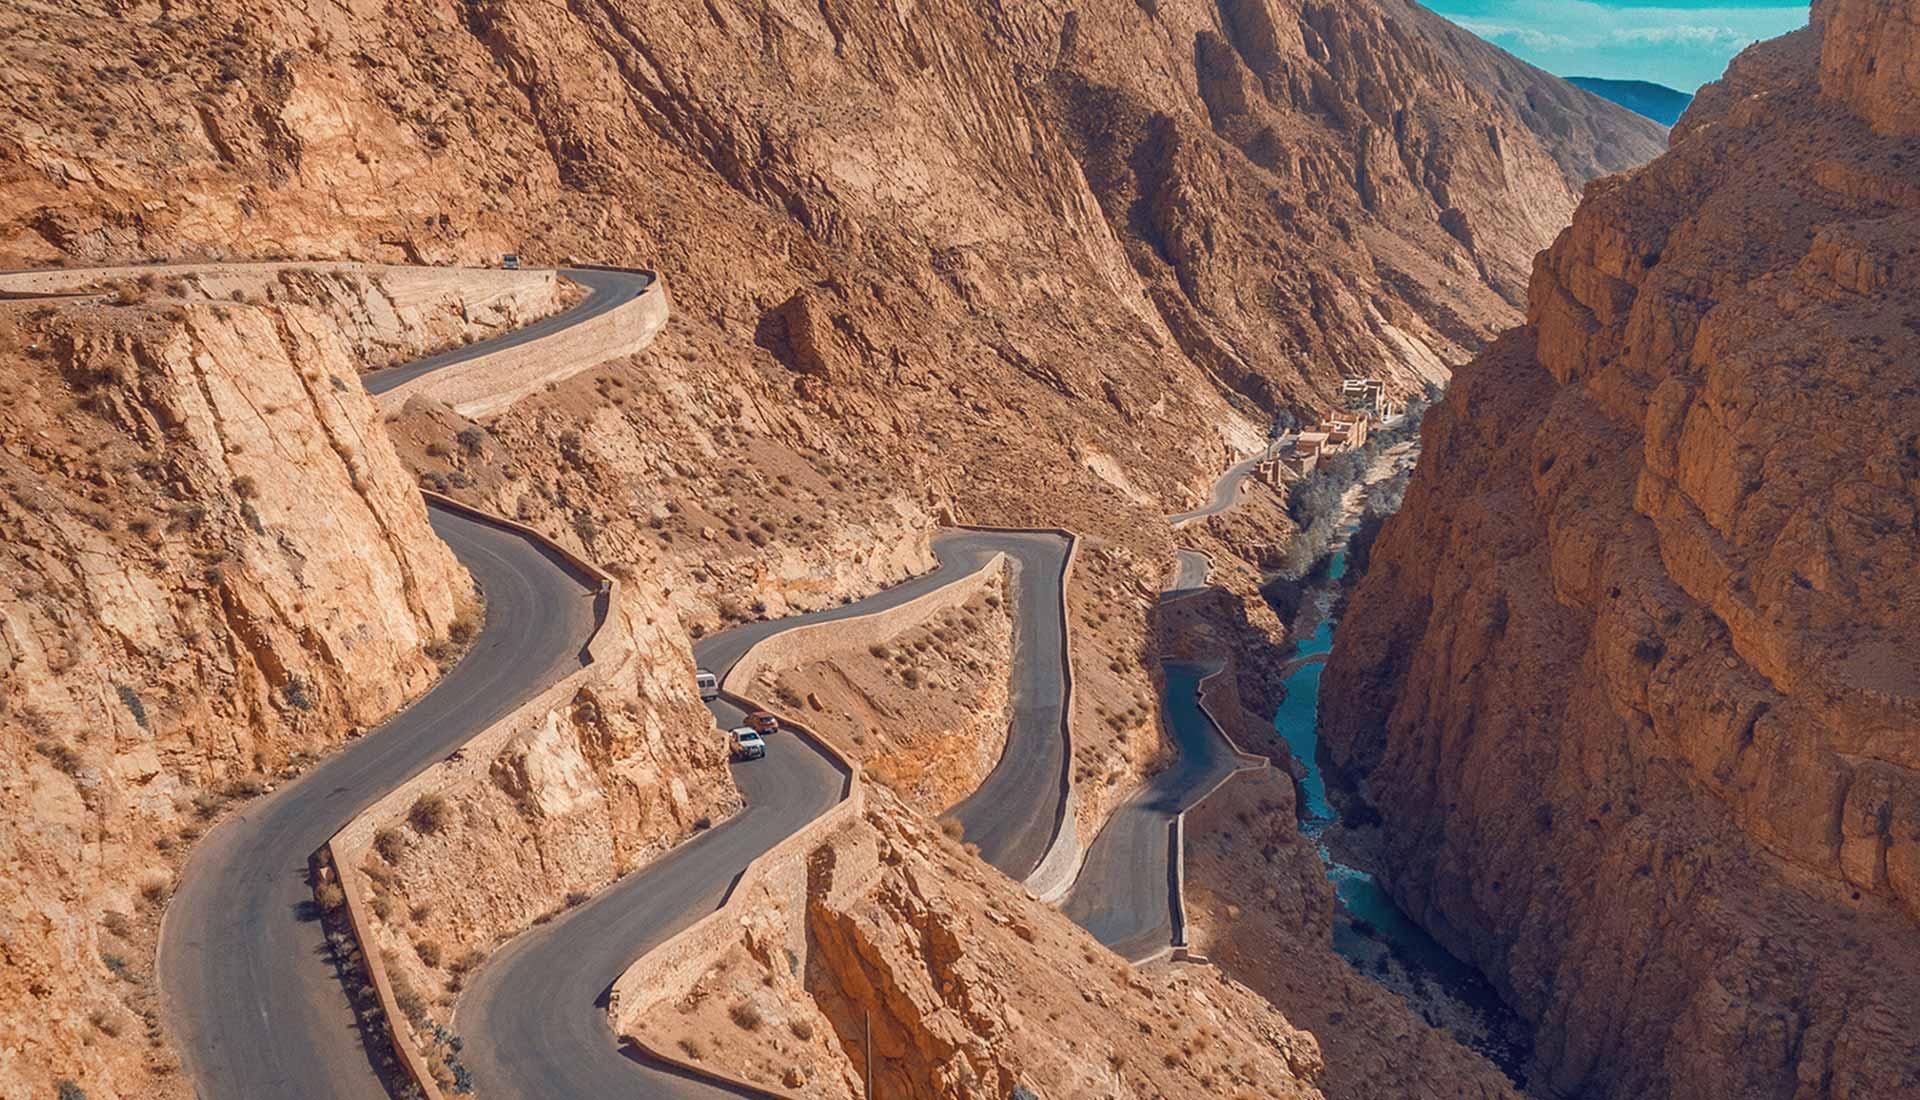 Marruecos3